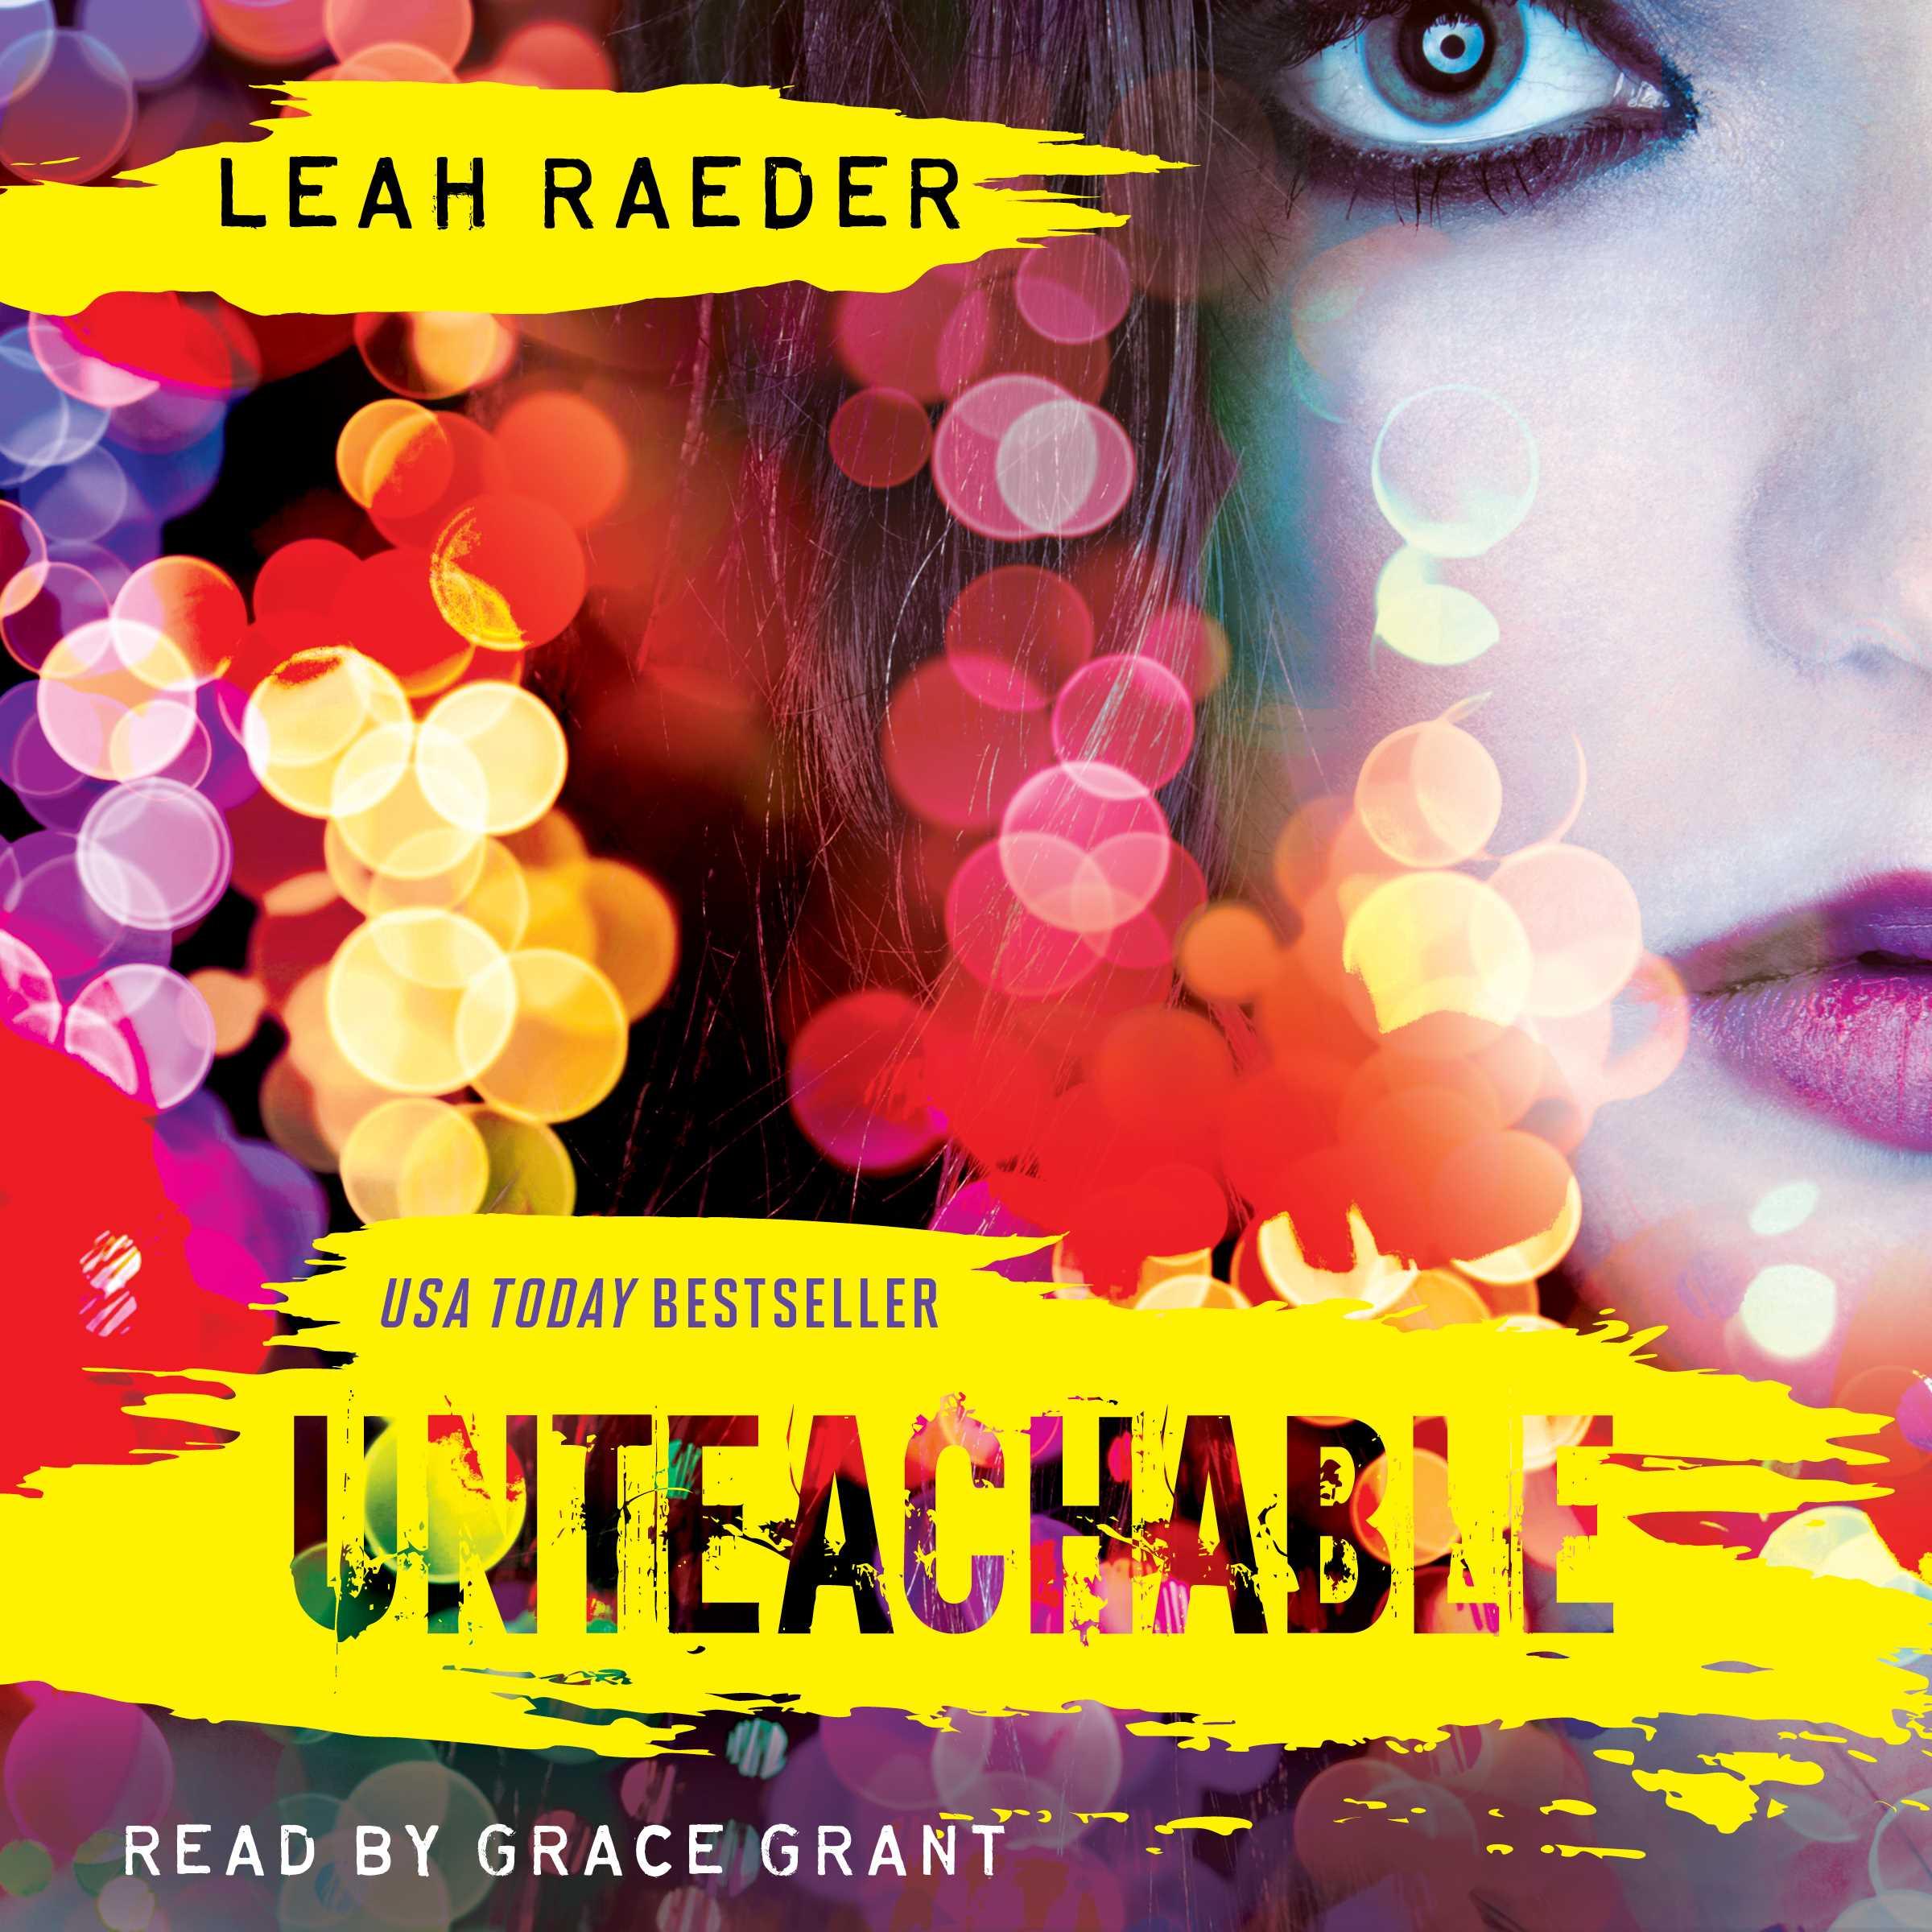 UNTEACHABLE LEAH RAEDER EPUB